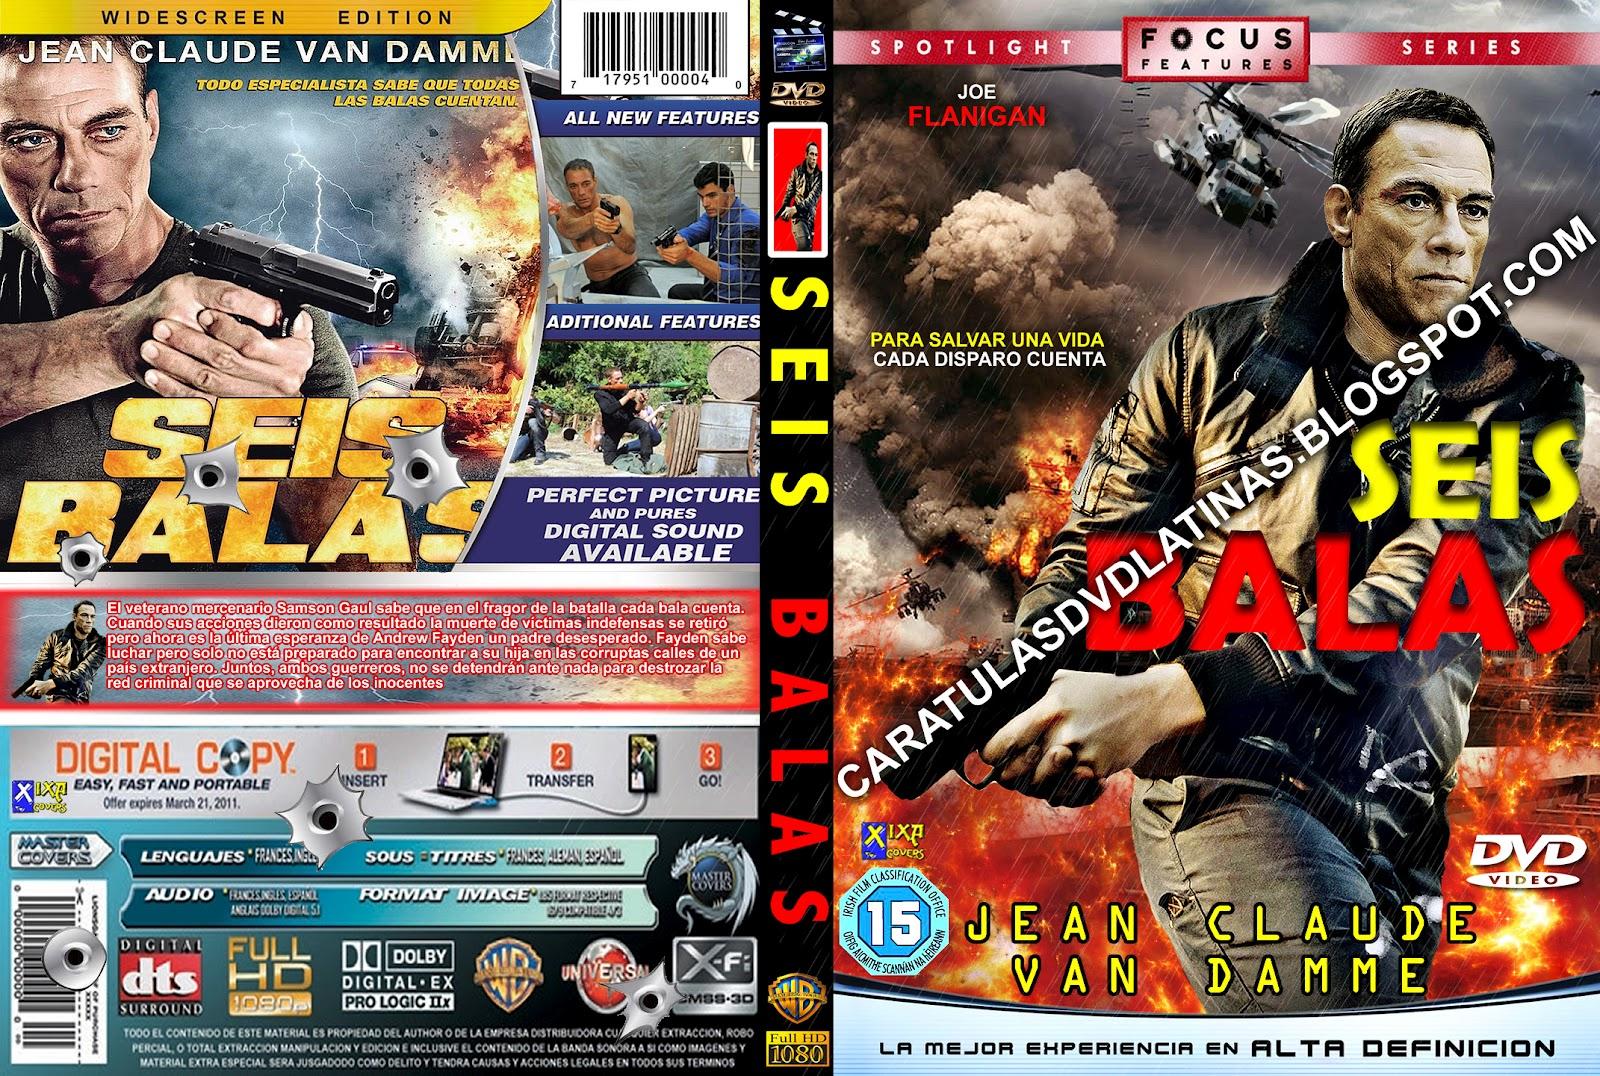 CARATULAS DVD LATINAS: SEIS BALAS dvd cover caratula SIX BULLETS